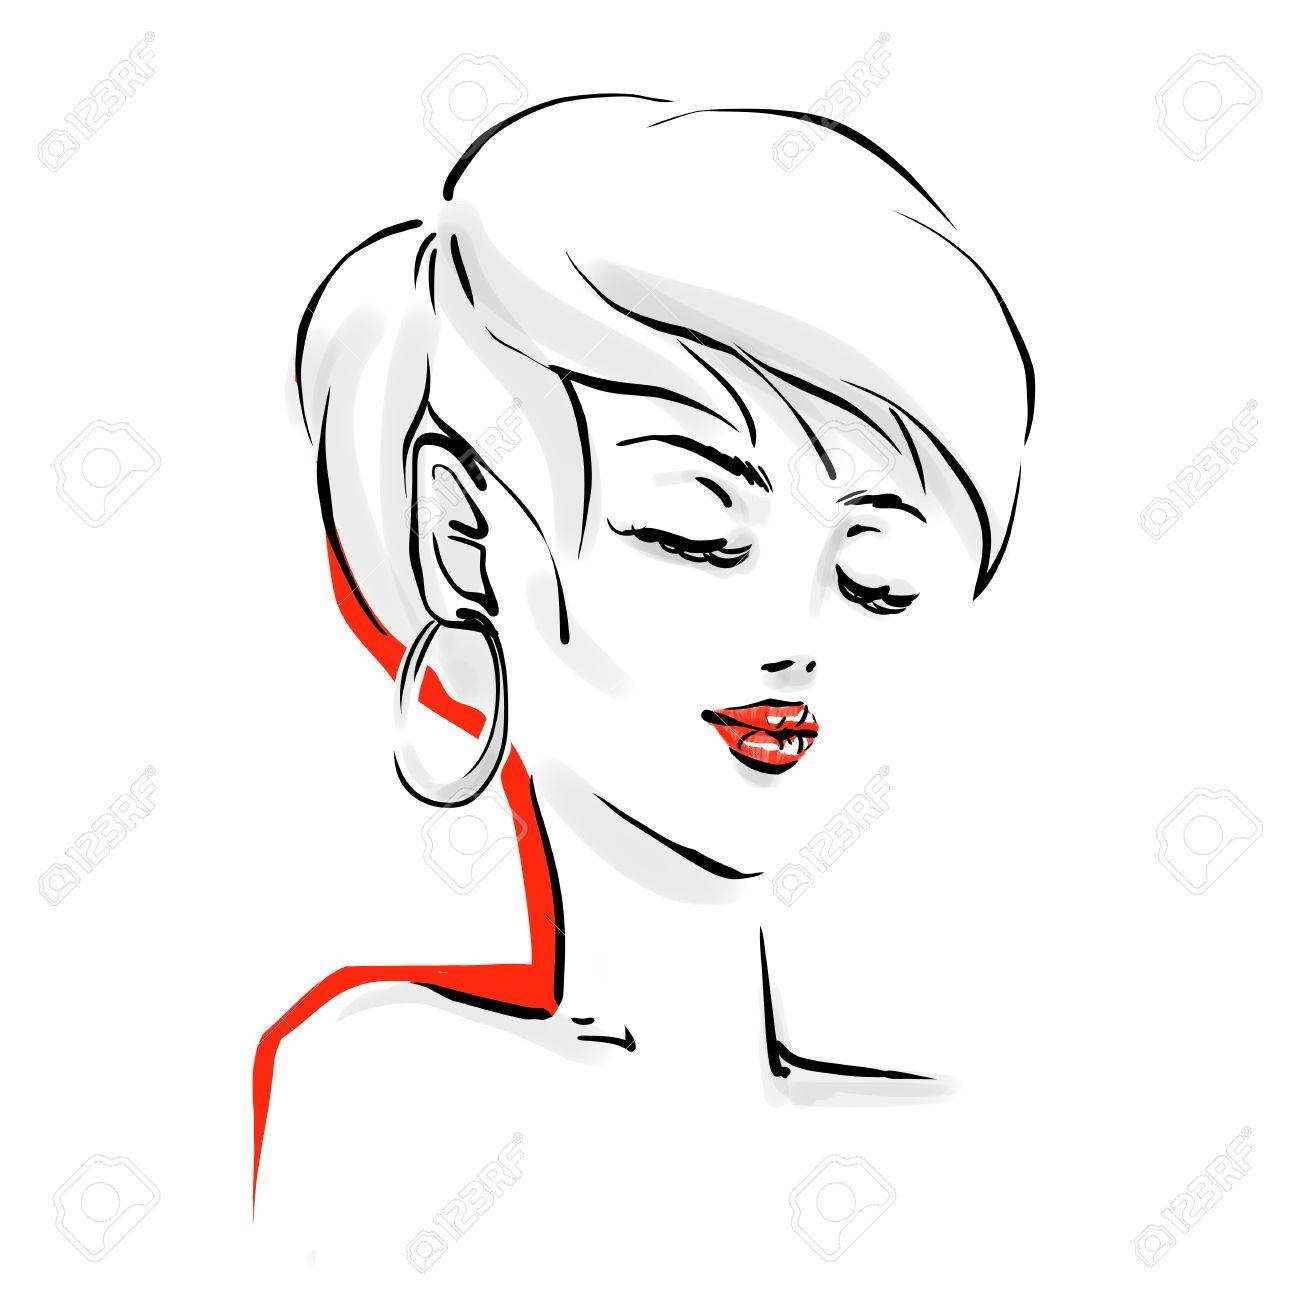 Dibujos De Mujeres Con Cabello Corto